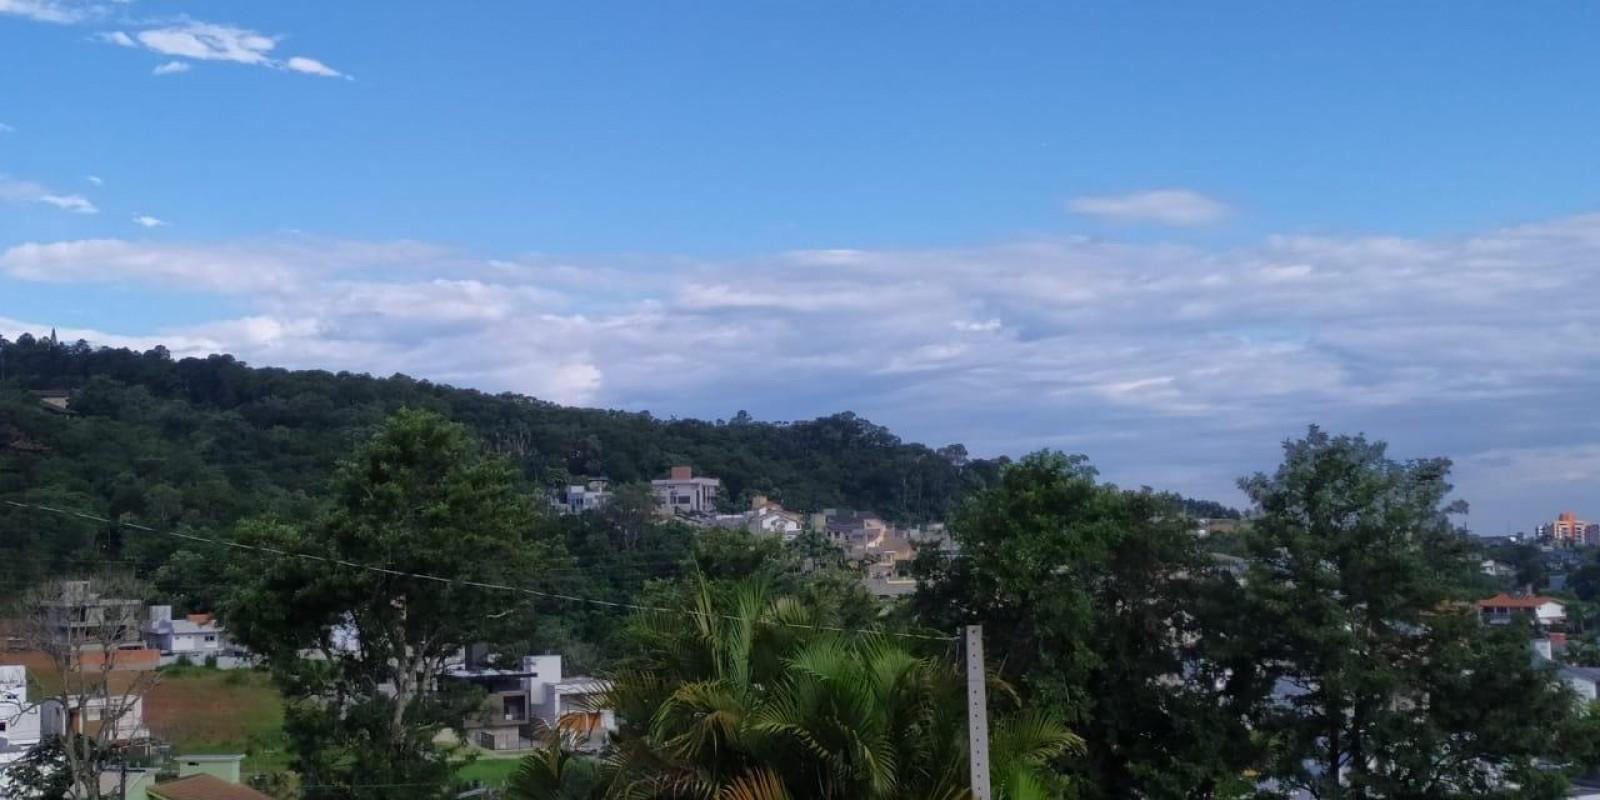 CASA MINA BRASIL - Foto 7 de 7